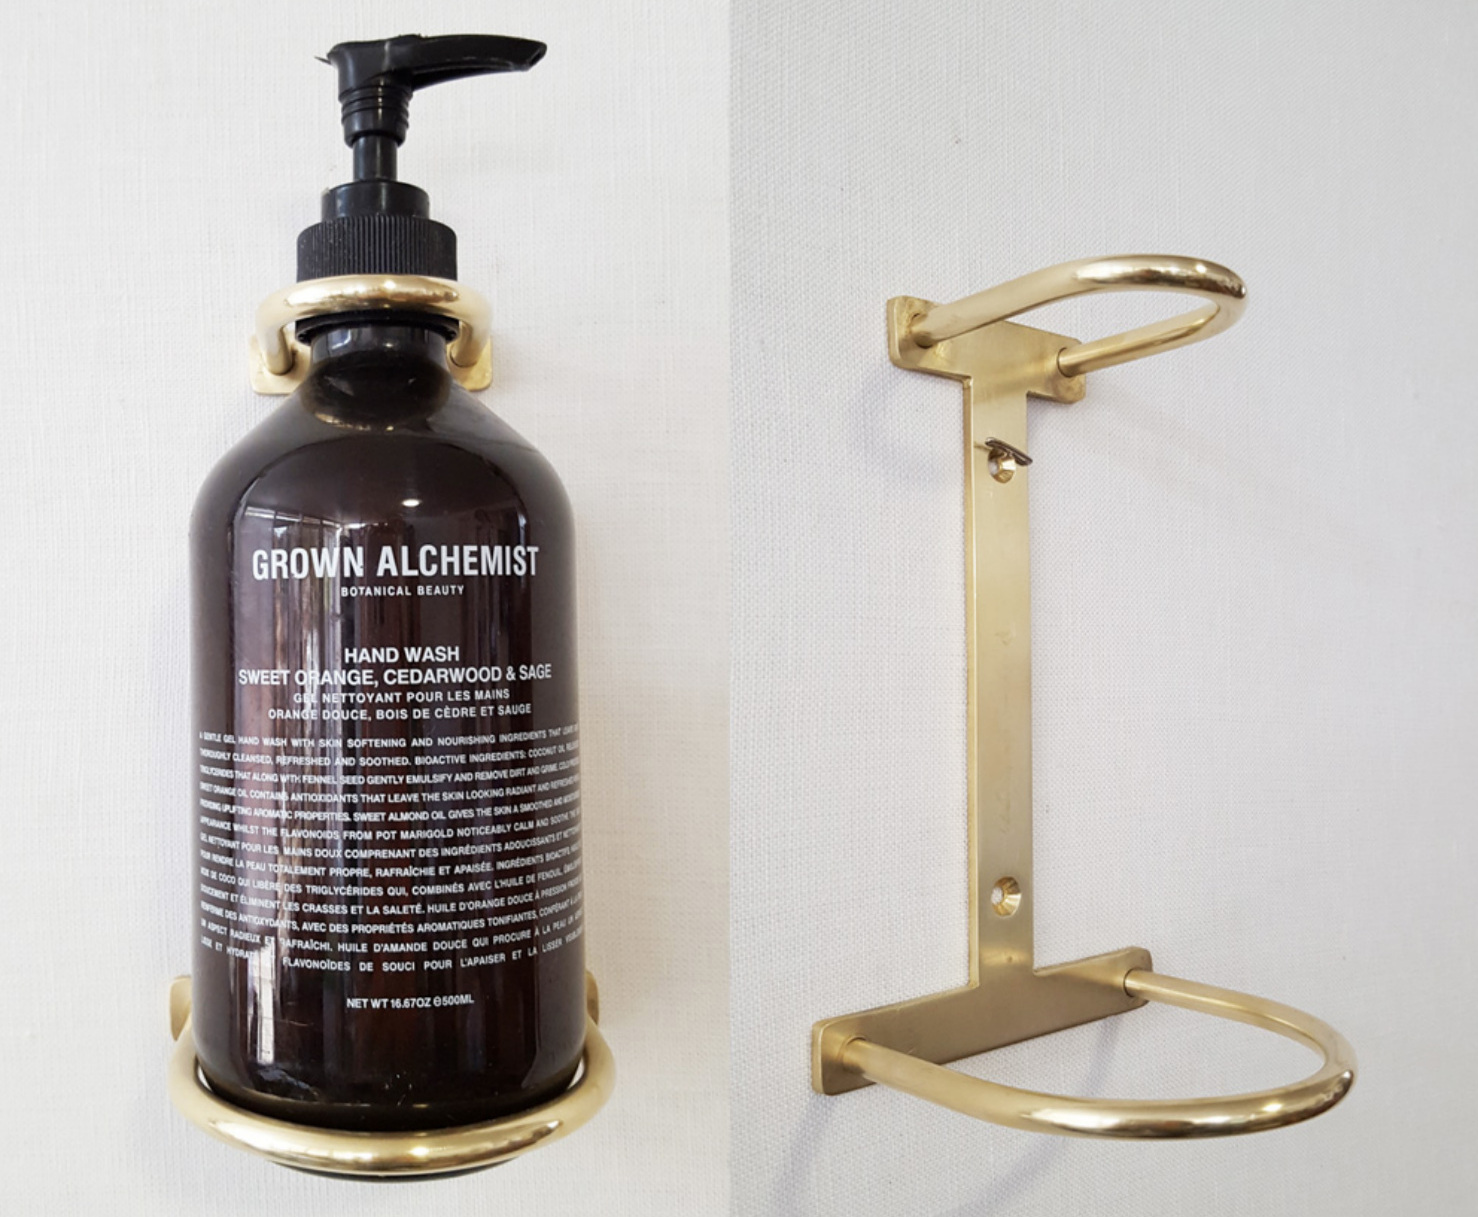 BRASS SOAP HOLDERS @ VARIOUS LOCATIONS, CUSTOM FOR GROWN ALCHEMIST